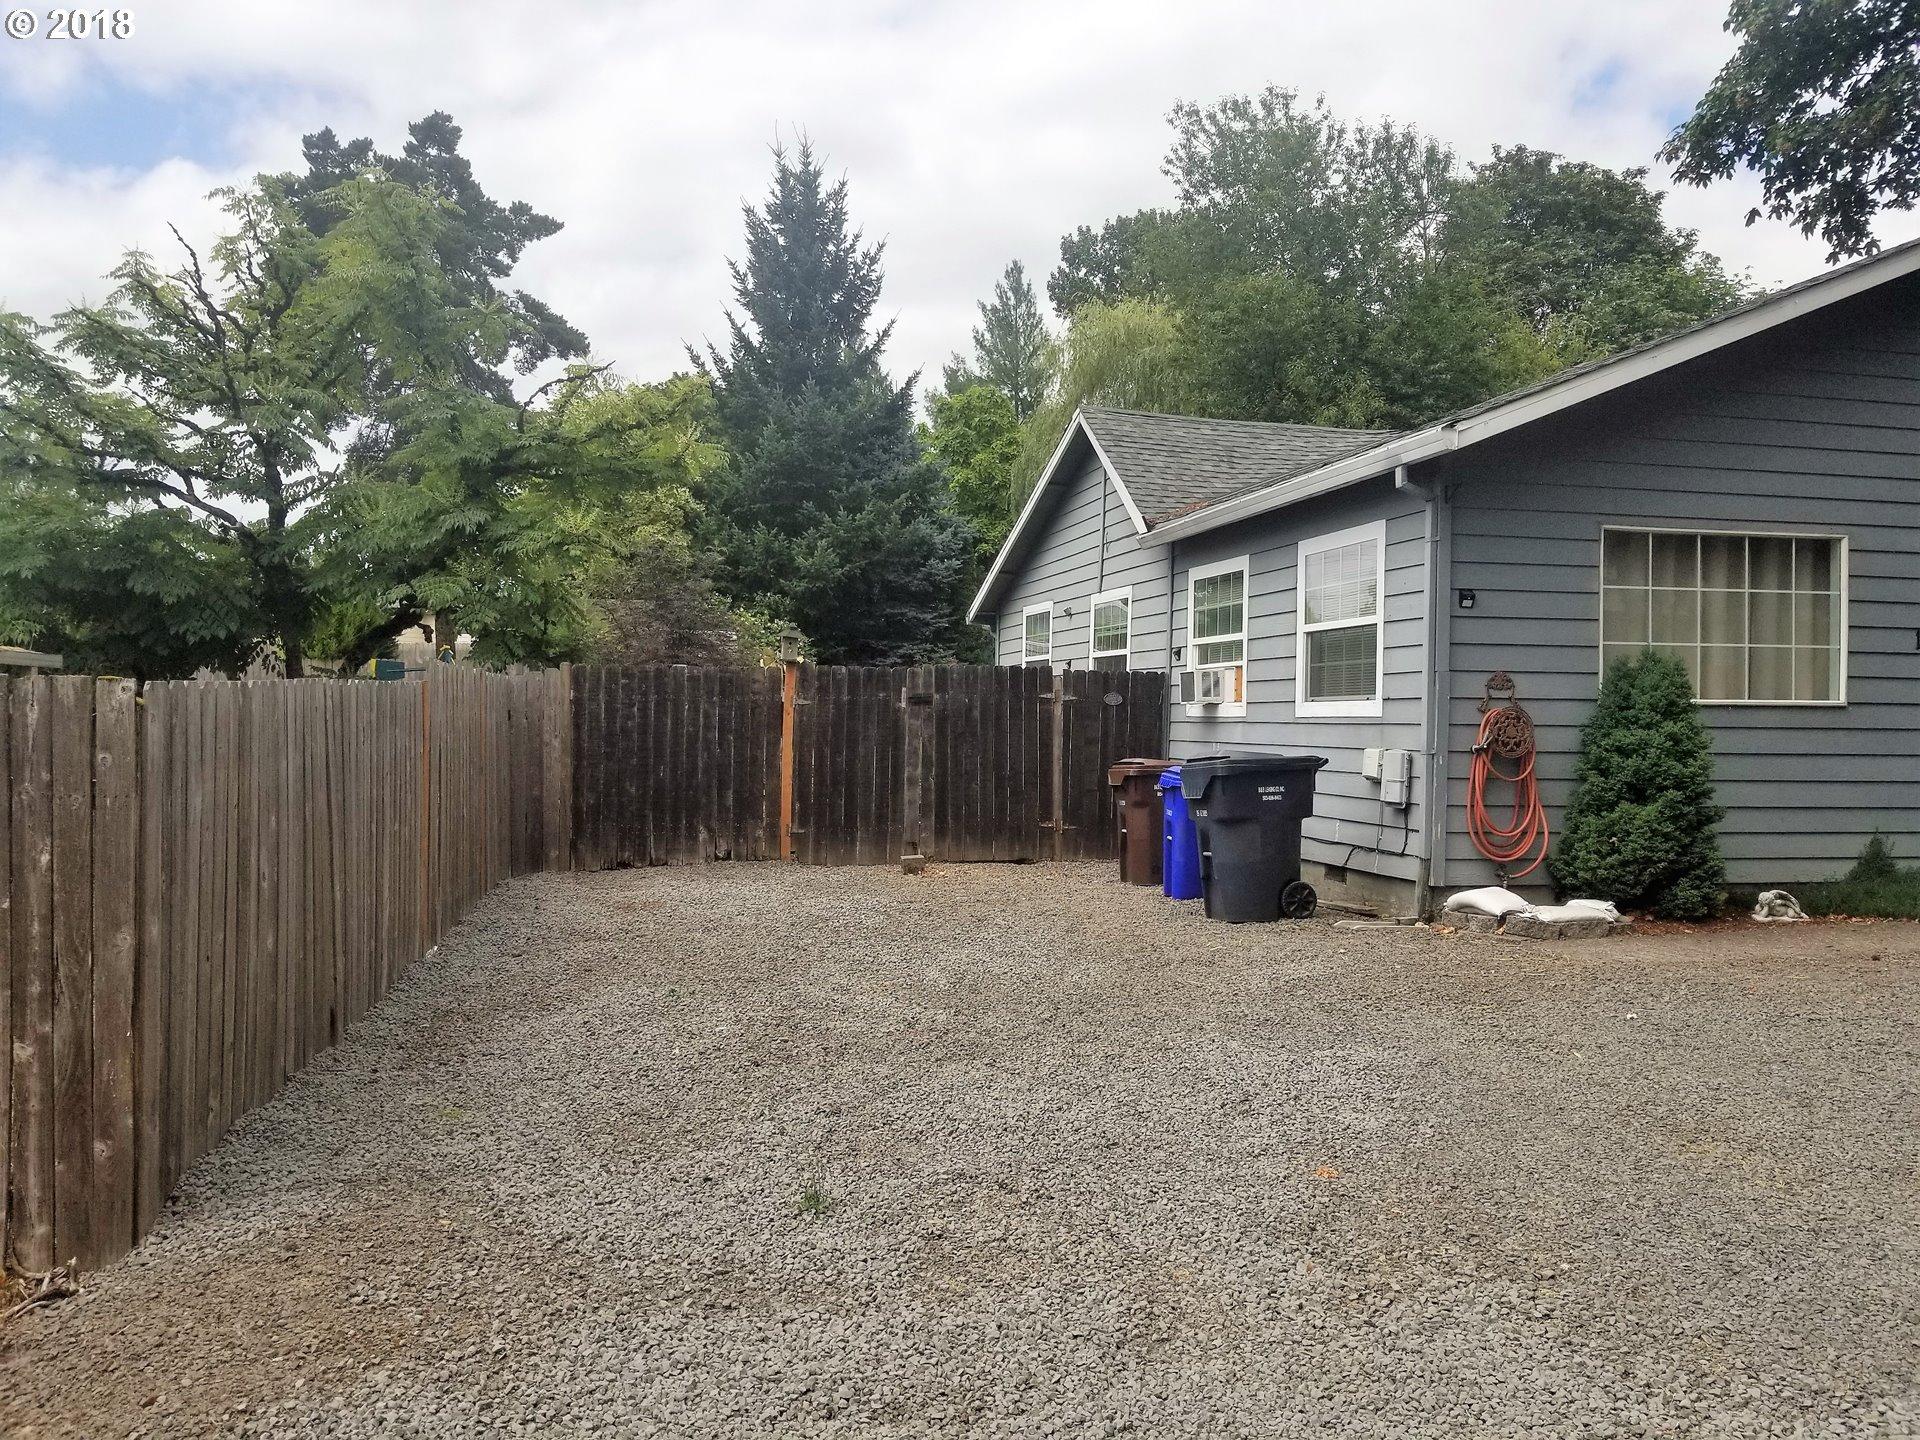 13829 HOLCOMB BLVD Oregon City, OR 97045 - MLS #: 18693310